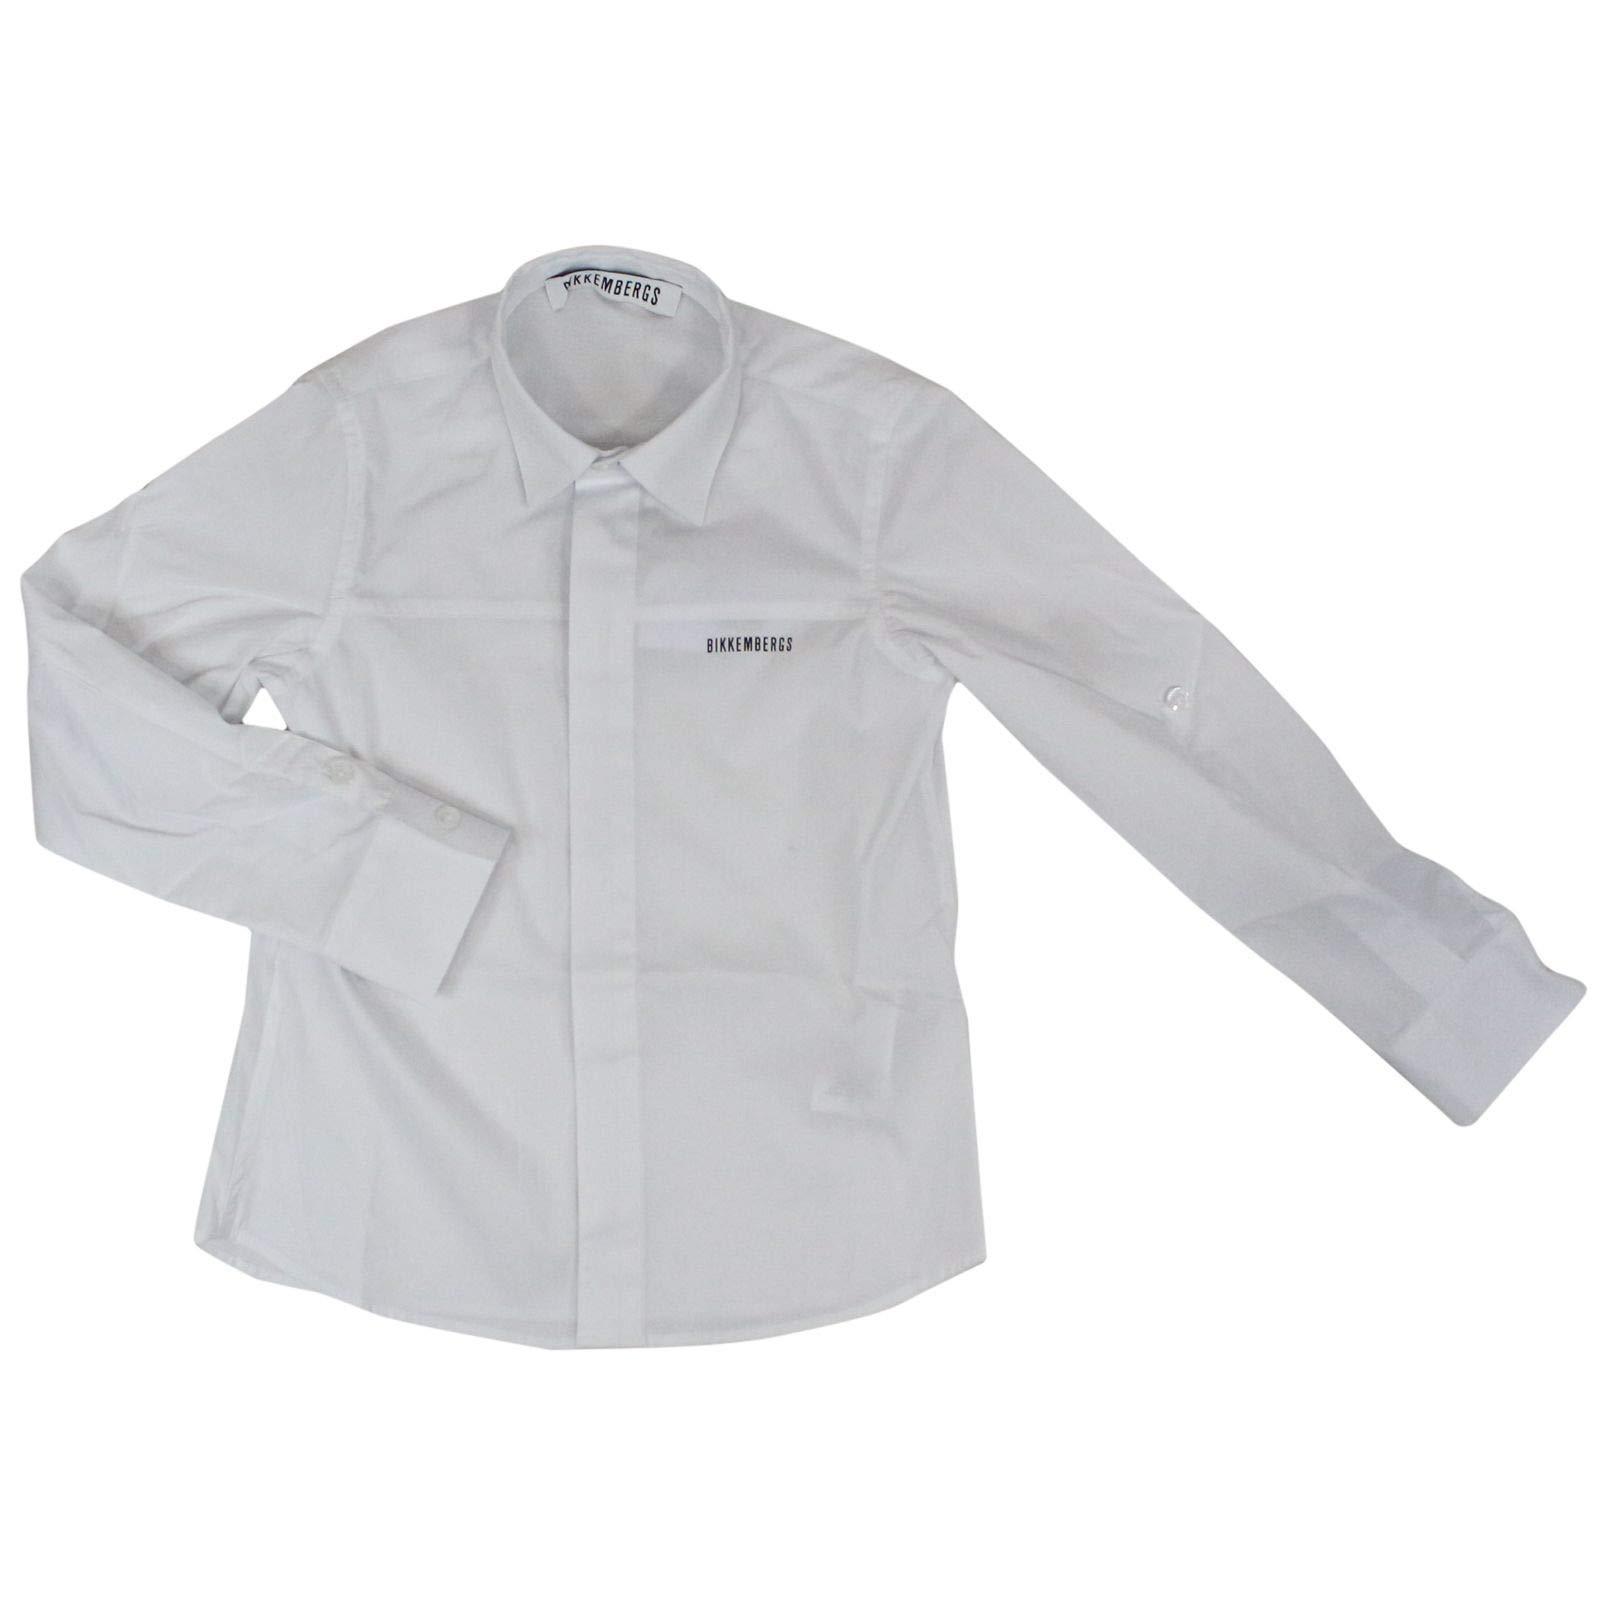 Bikkembergs Luxury Fashion Boys Shirt Summer White